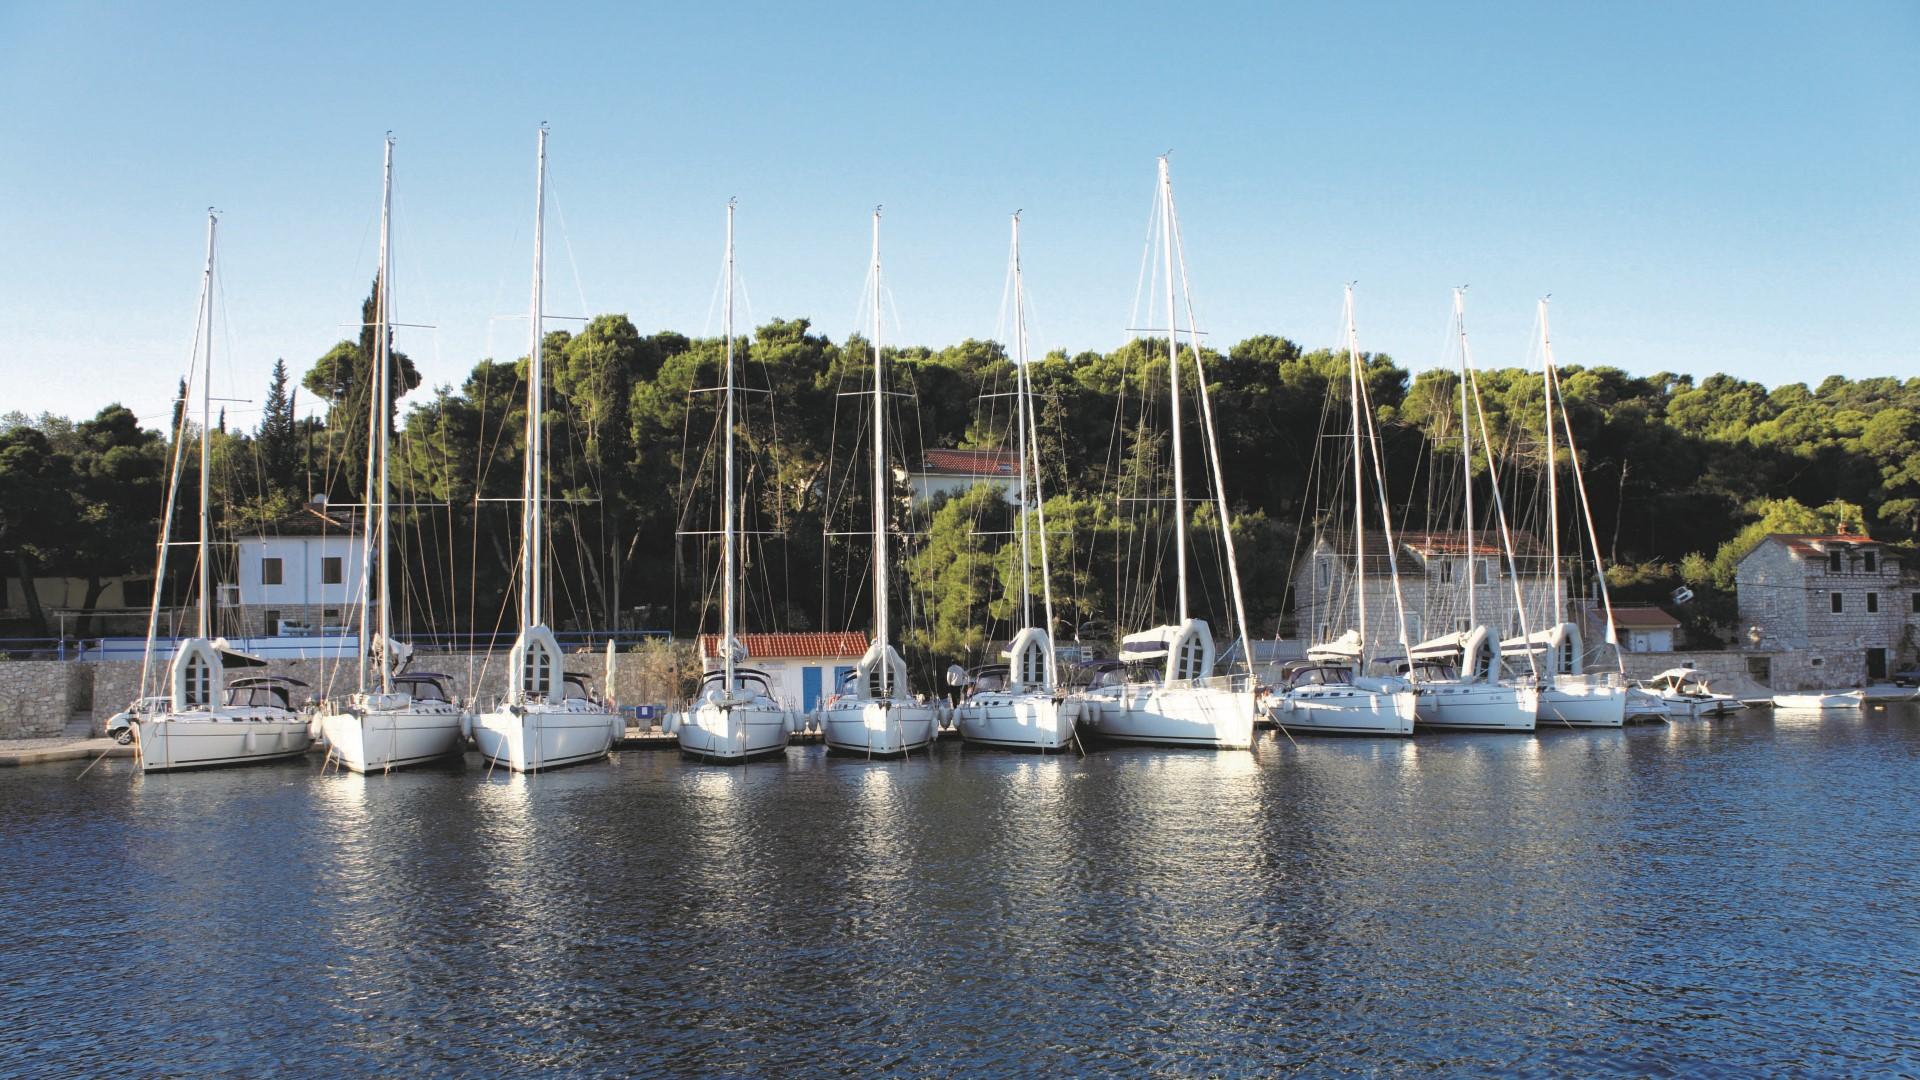 Oceanis 41.1 (GOA) Marina Rogač - sailboats (photo taken 2019) - 13